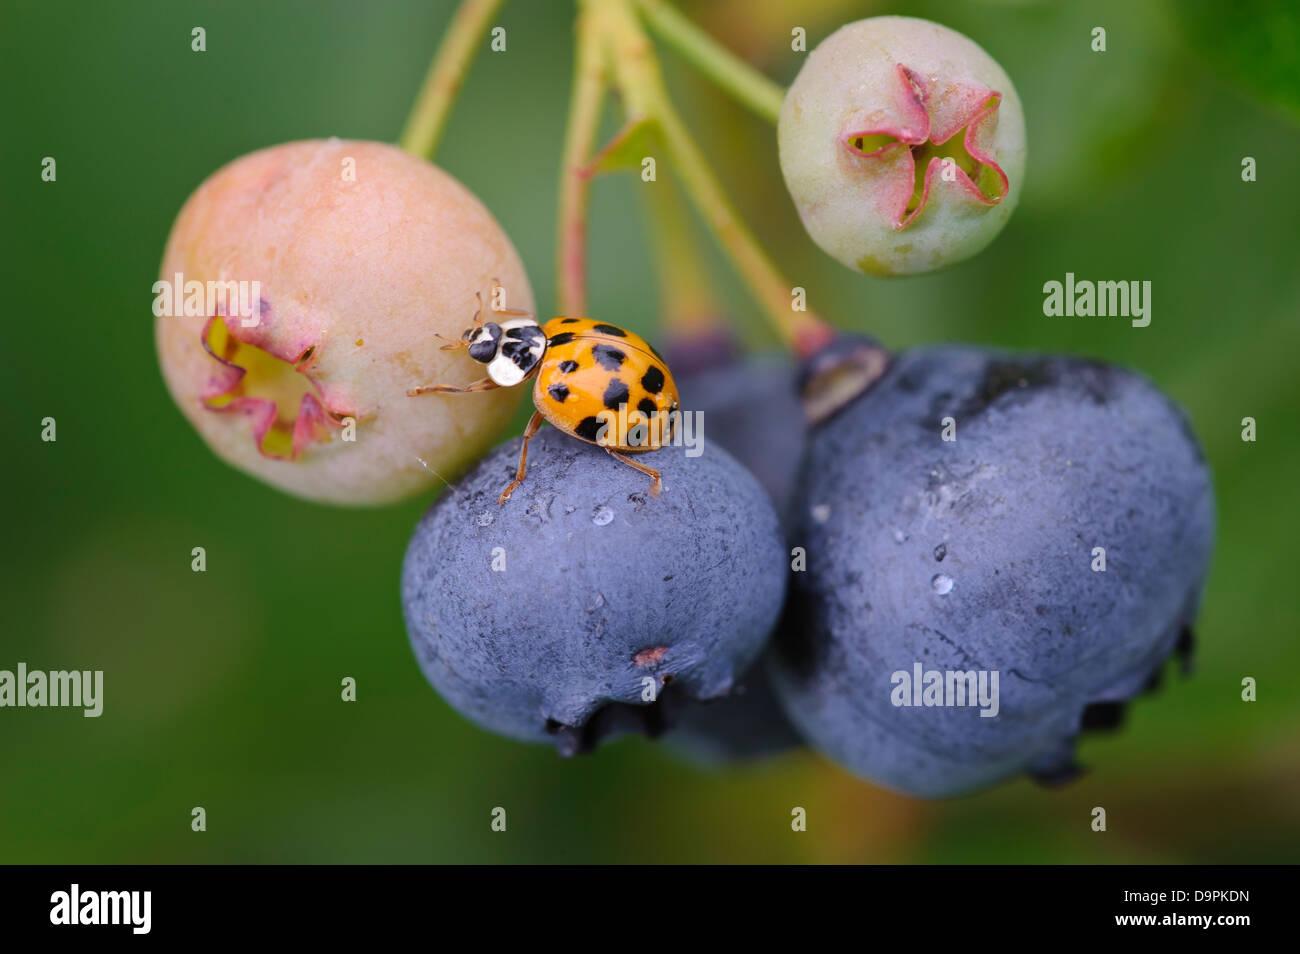 Harmonia axyridis, harlequin ladybird, Asiatische Marienkäfer, Blaubeere - Stock Image